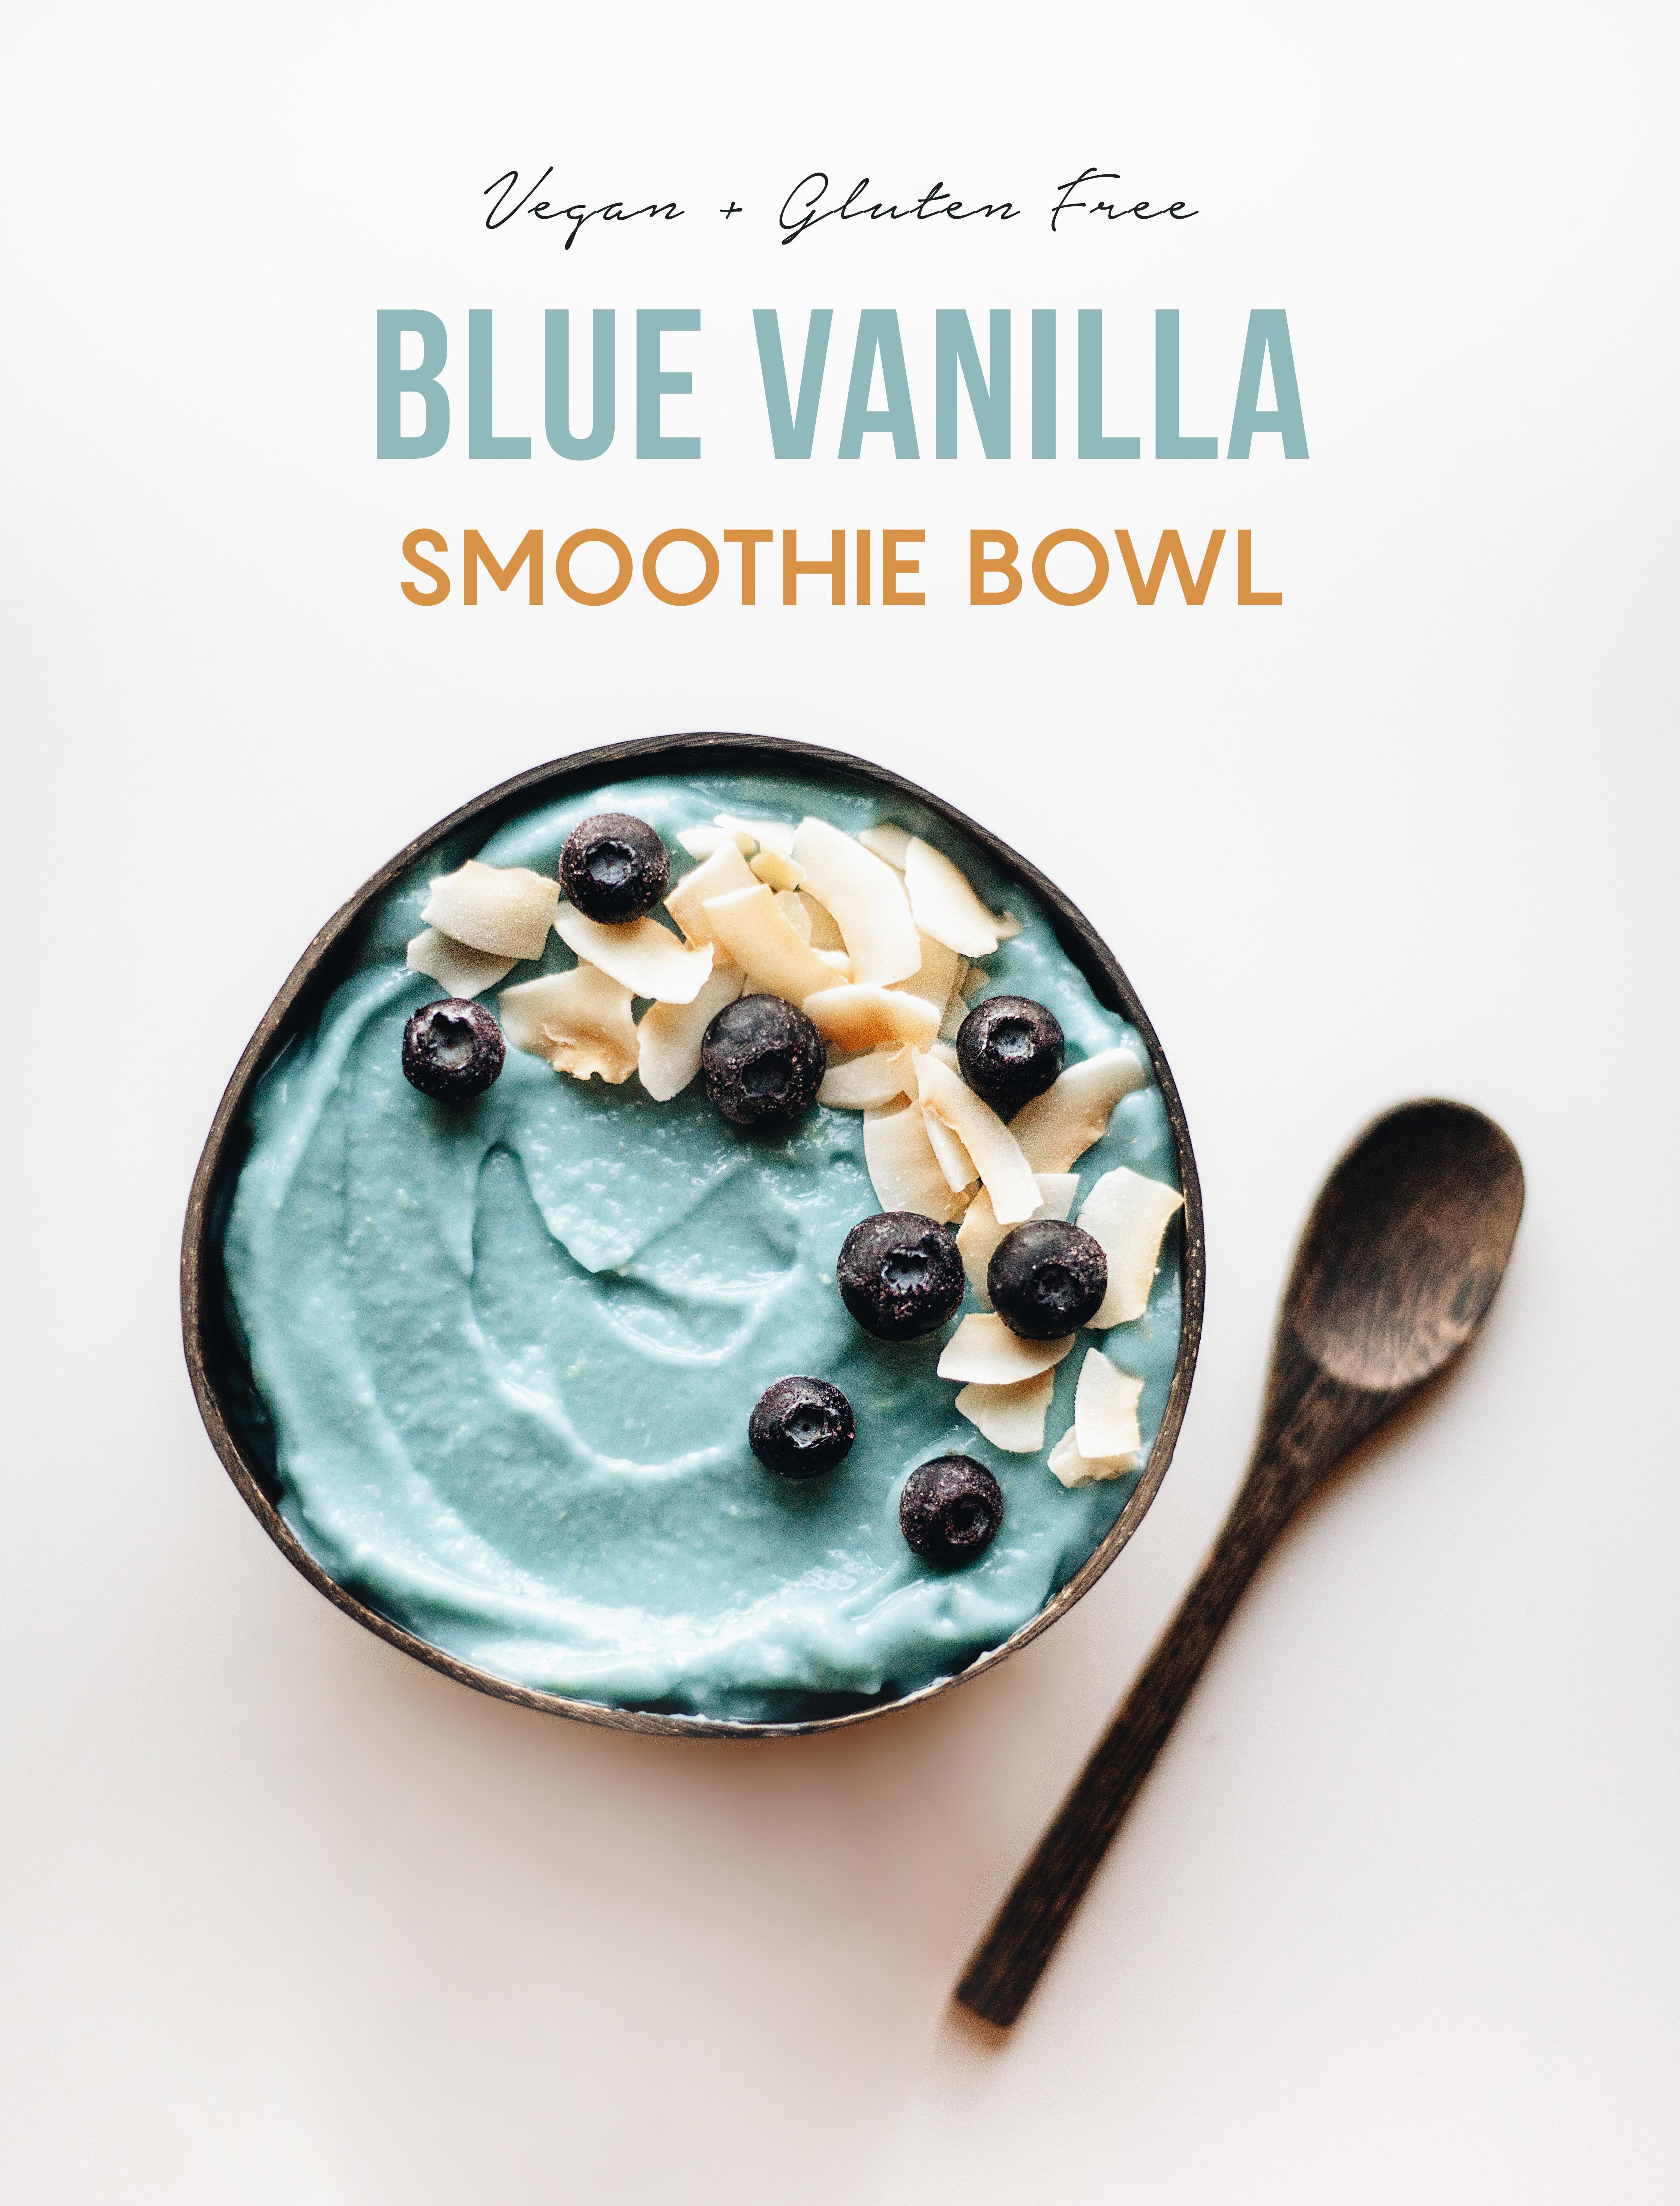 Blue Vanilla Smoothie Bowl